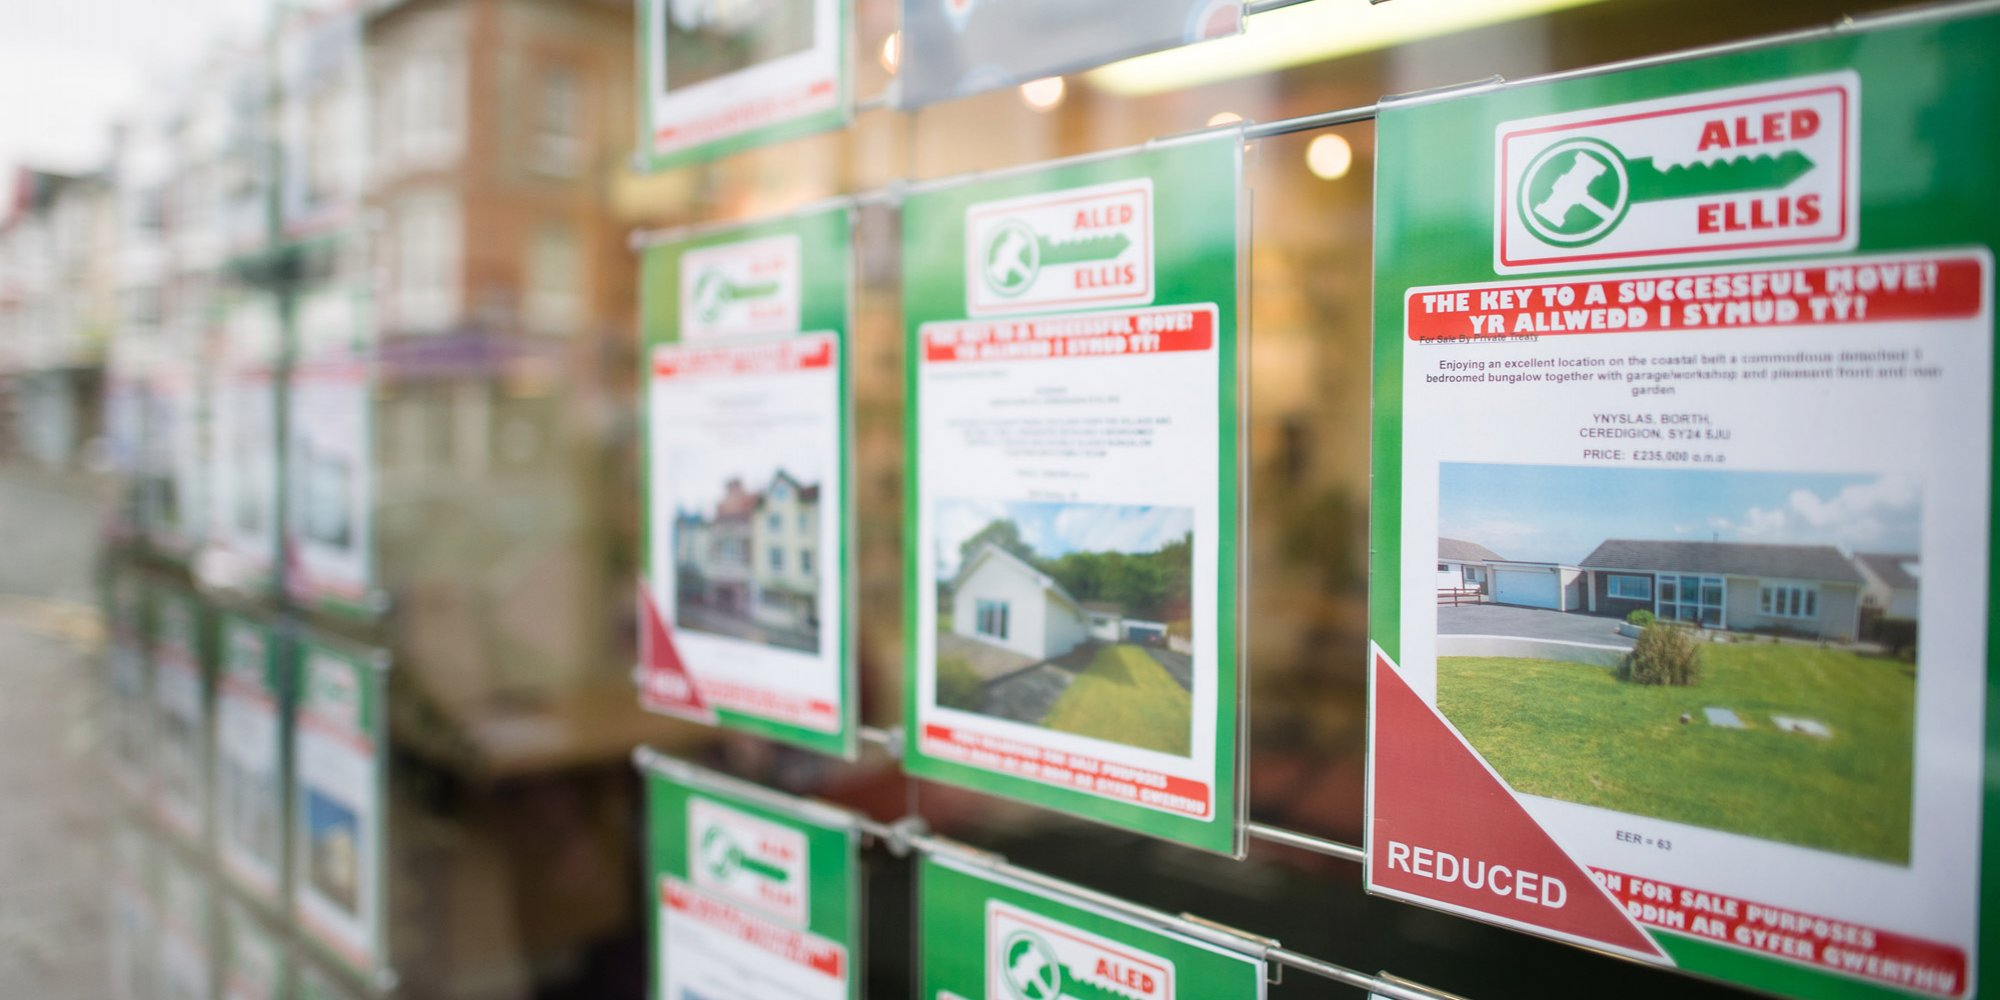 Aled Ellis Property Sales